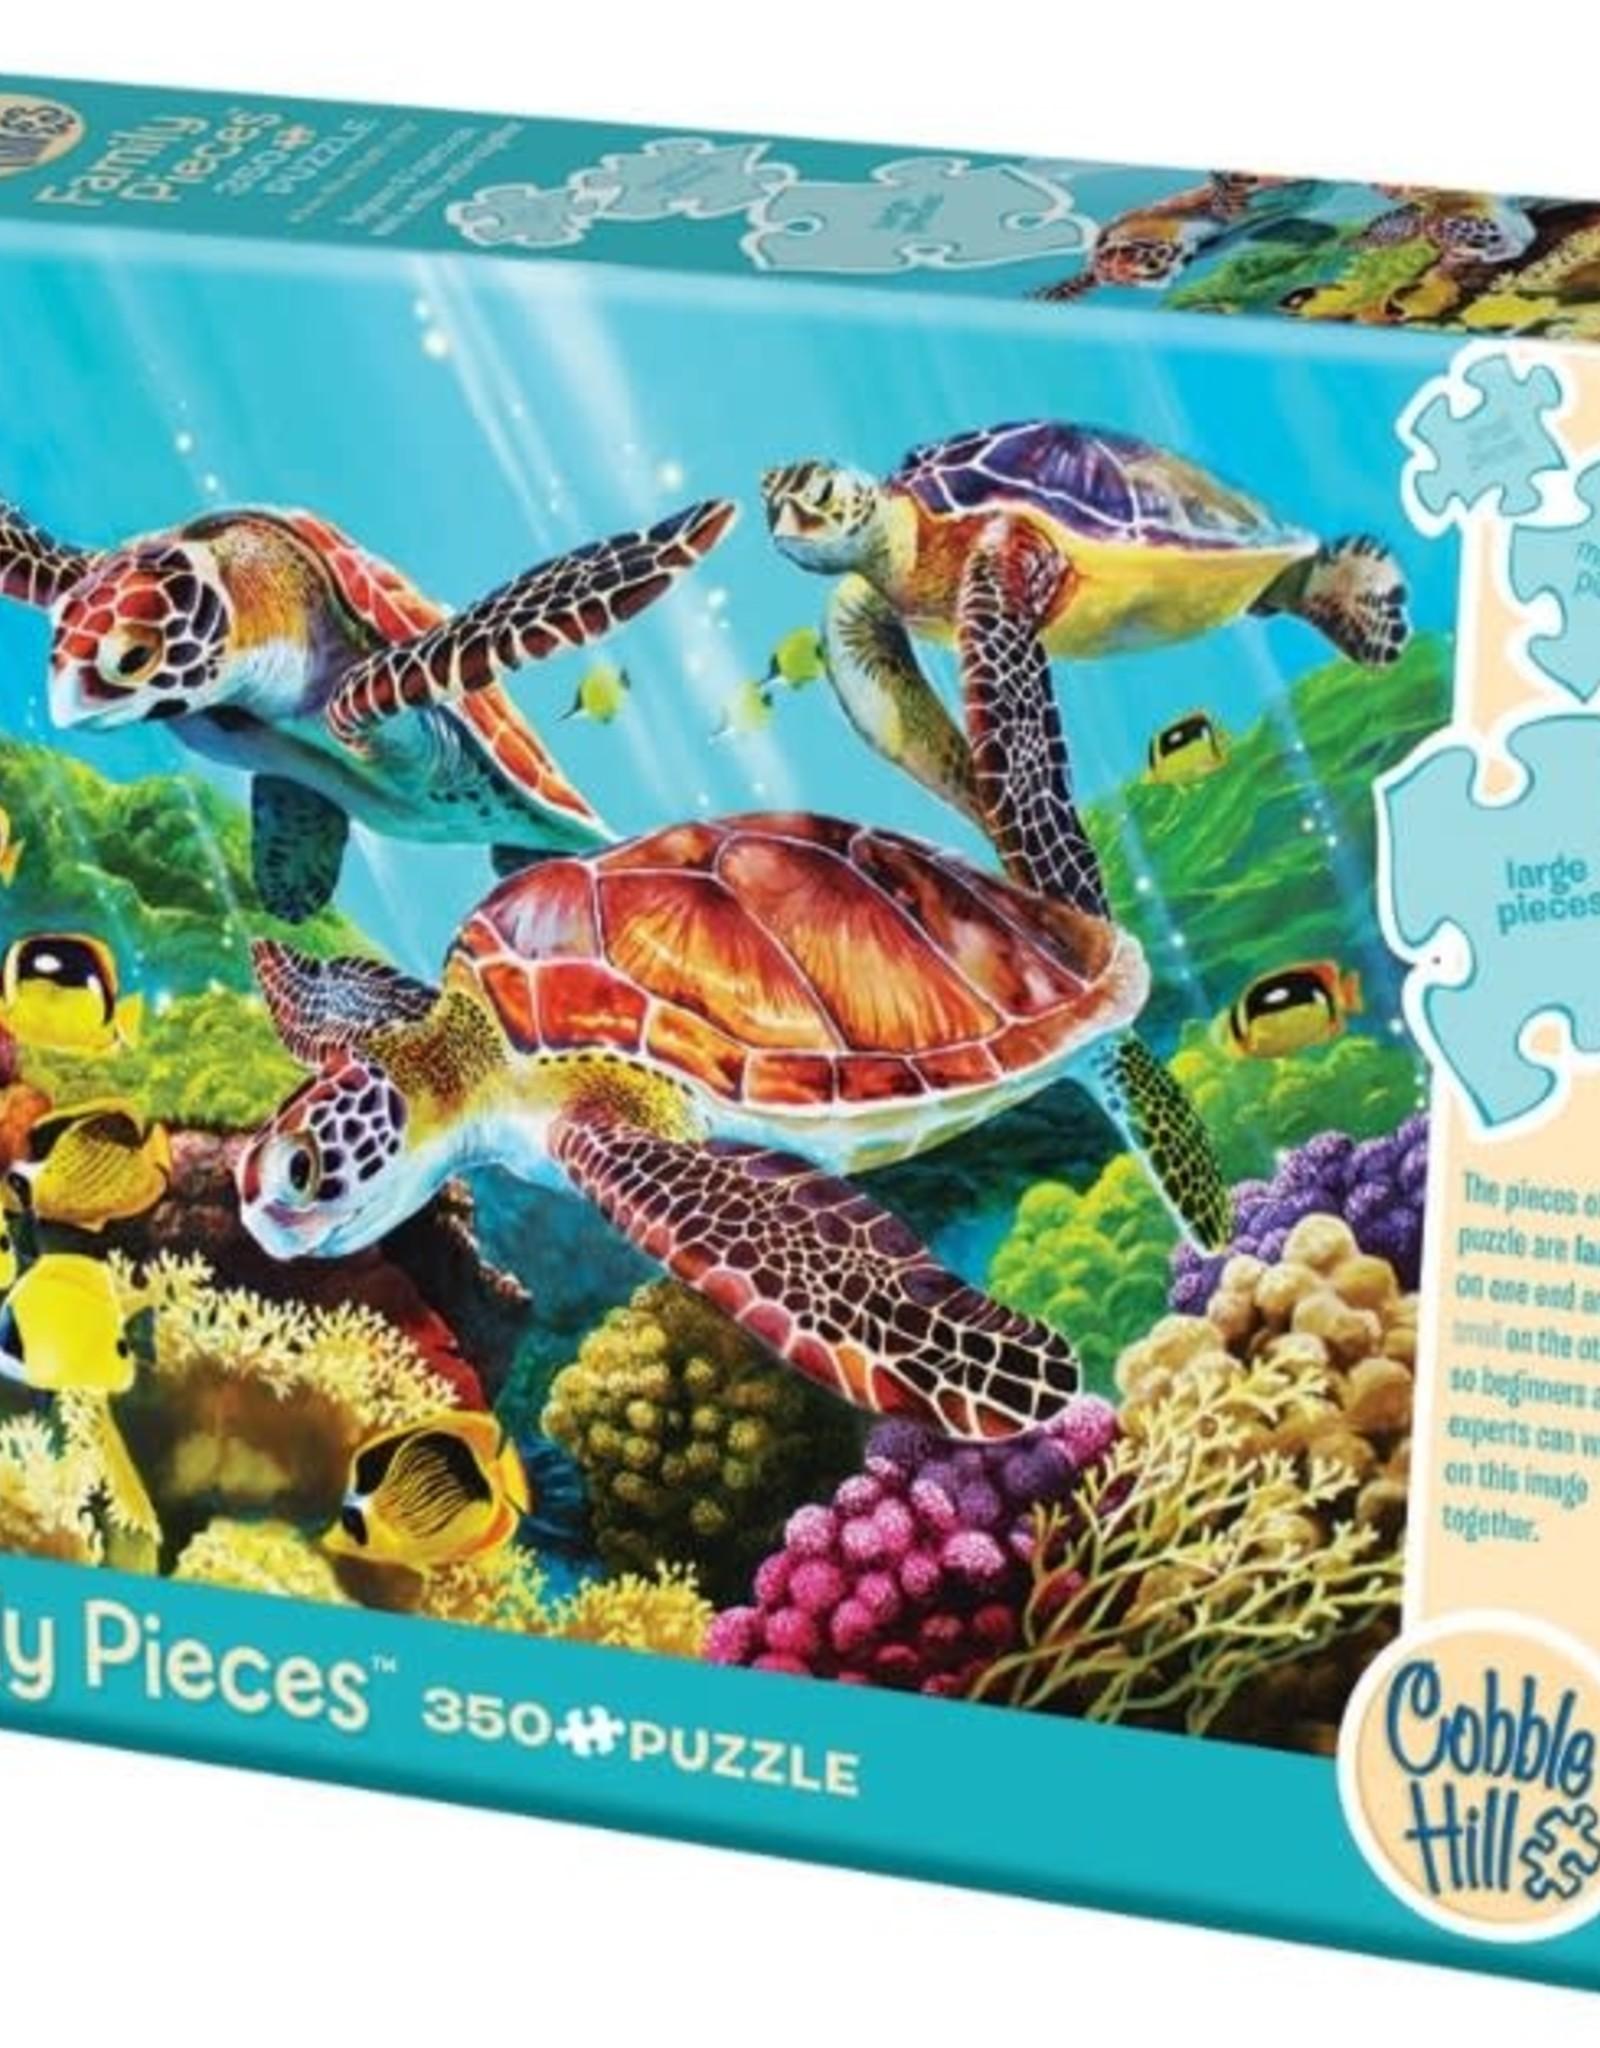 Cobble Hill Puzzles Molokini Current 350 piece puzzle - Family